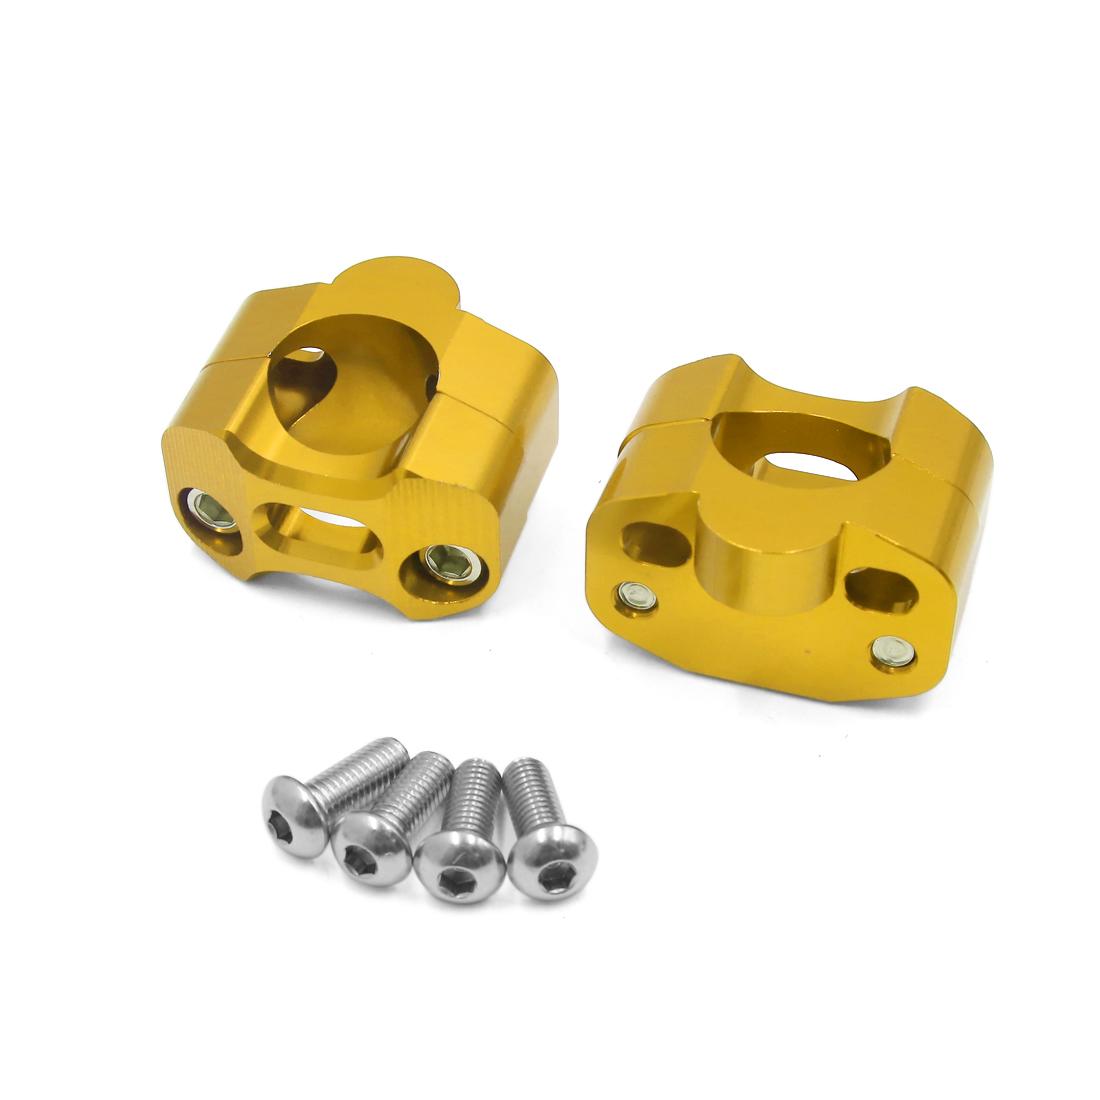 2Pcs Universal Gold Tone 28mm Handlebar Riser Clamp Adaptor for Motorcycle